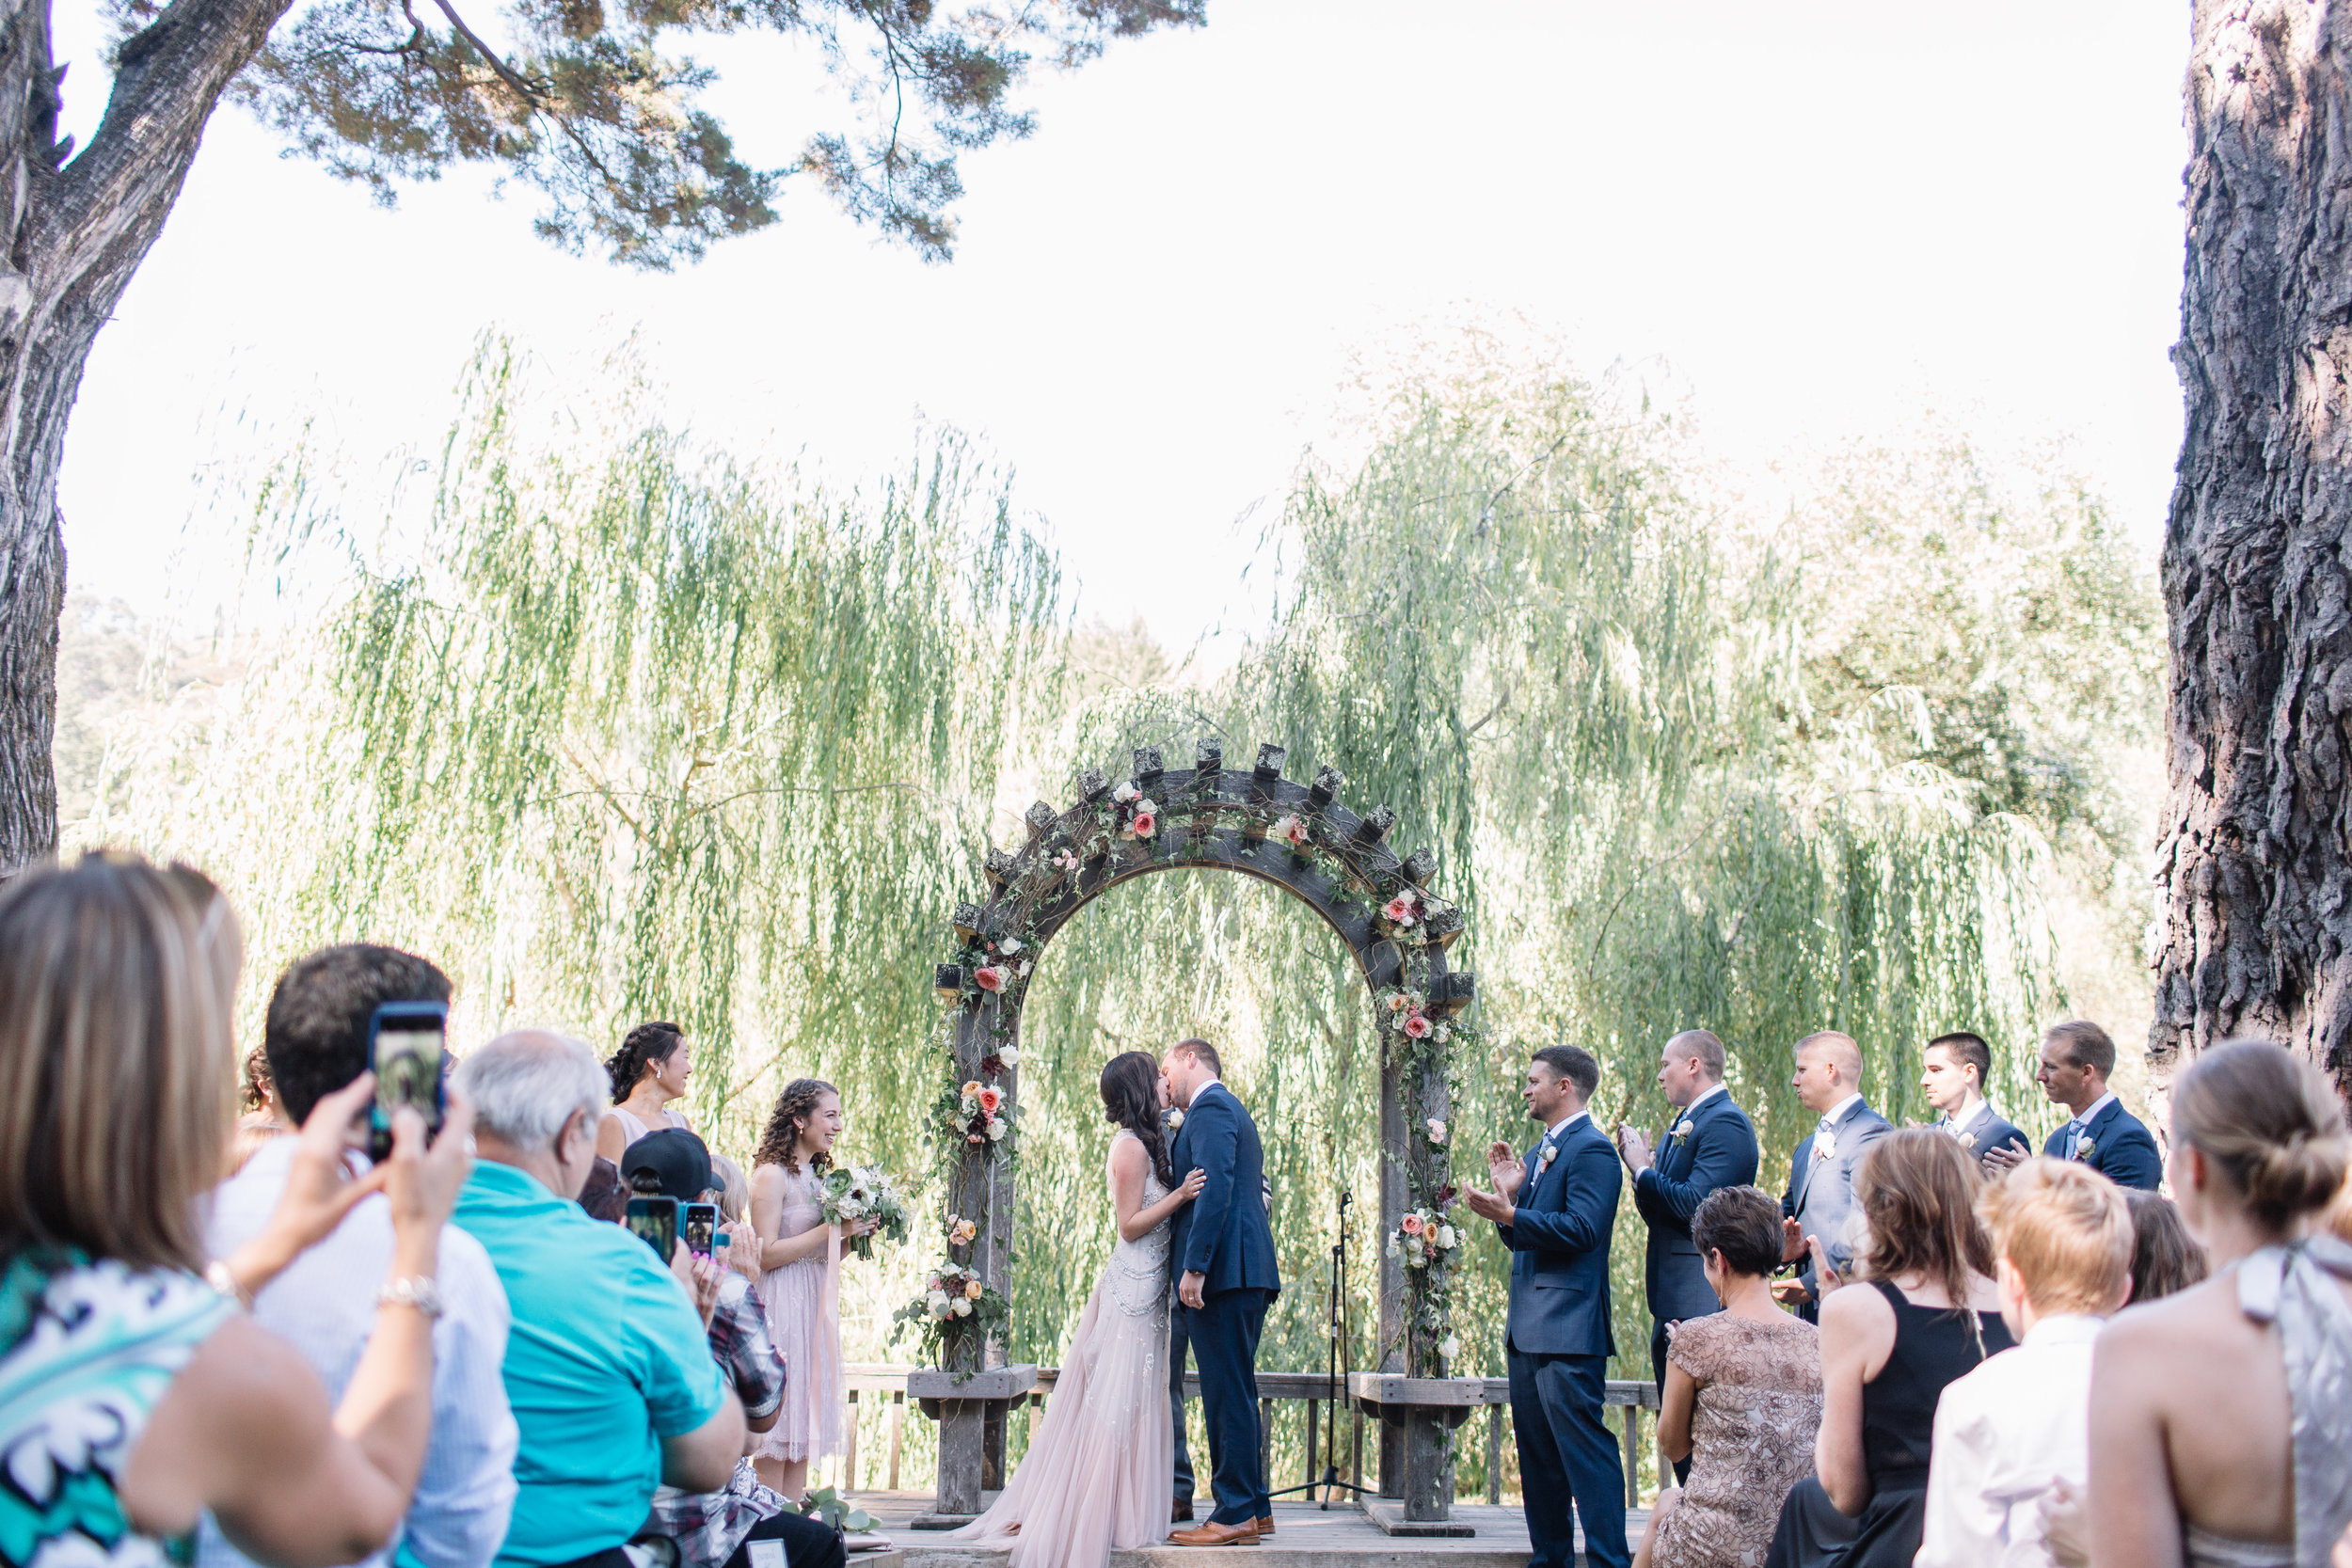 LishaWangPhotography_Carly_Matt_Wedding-115.jpg